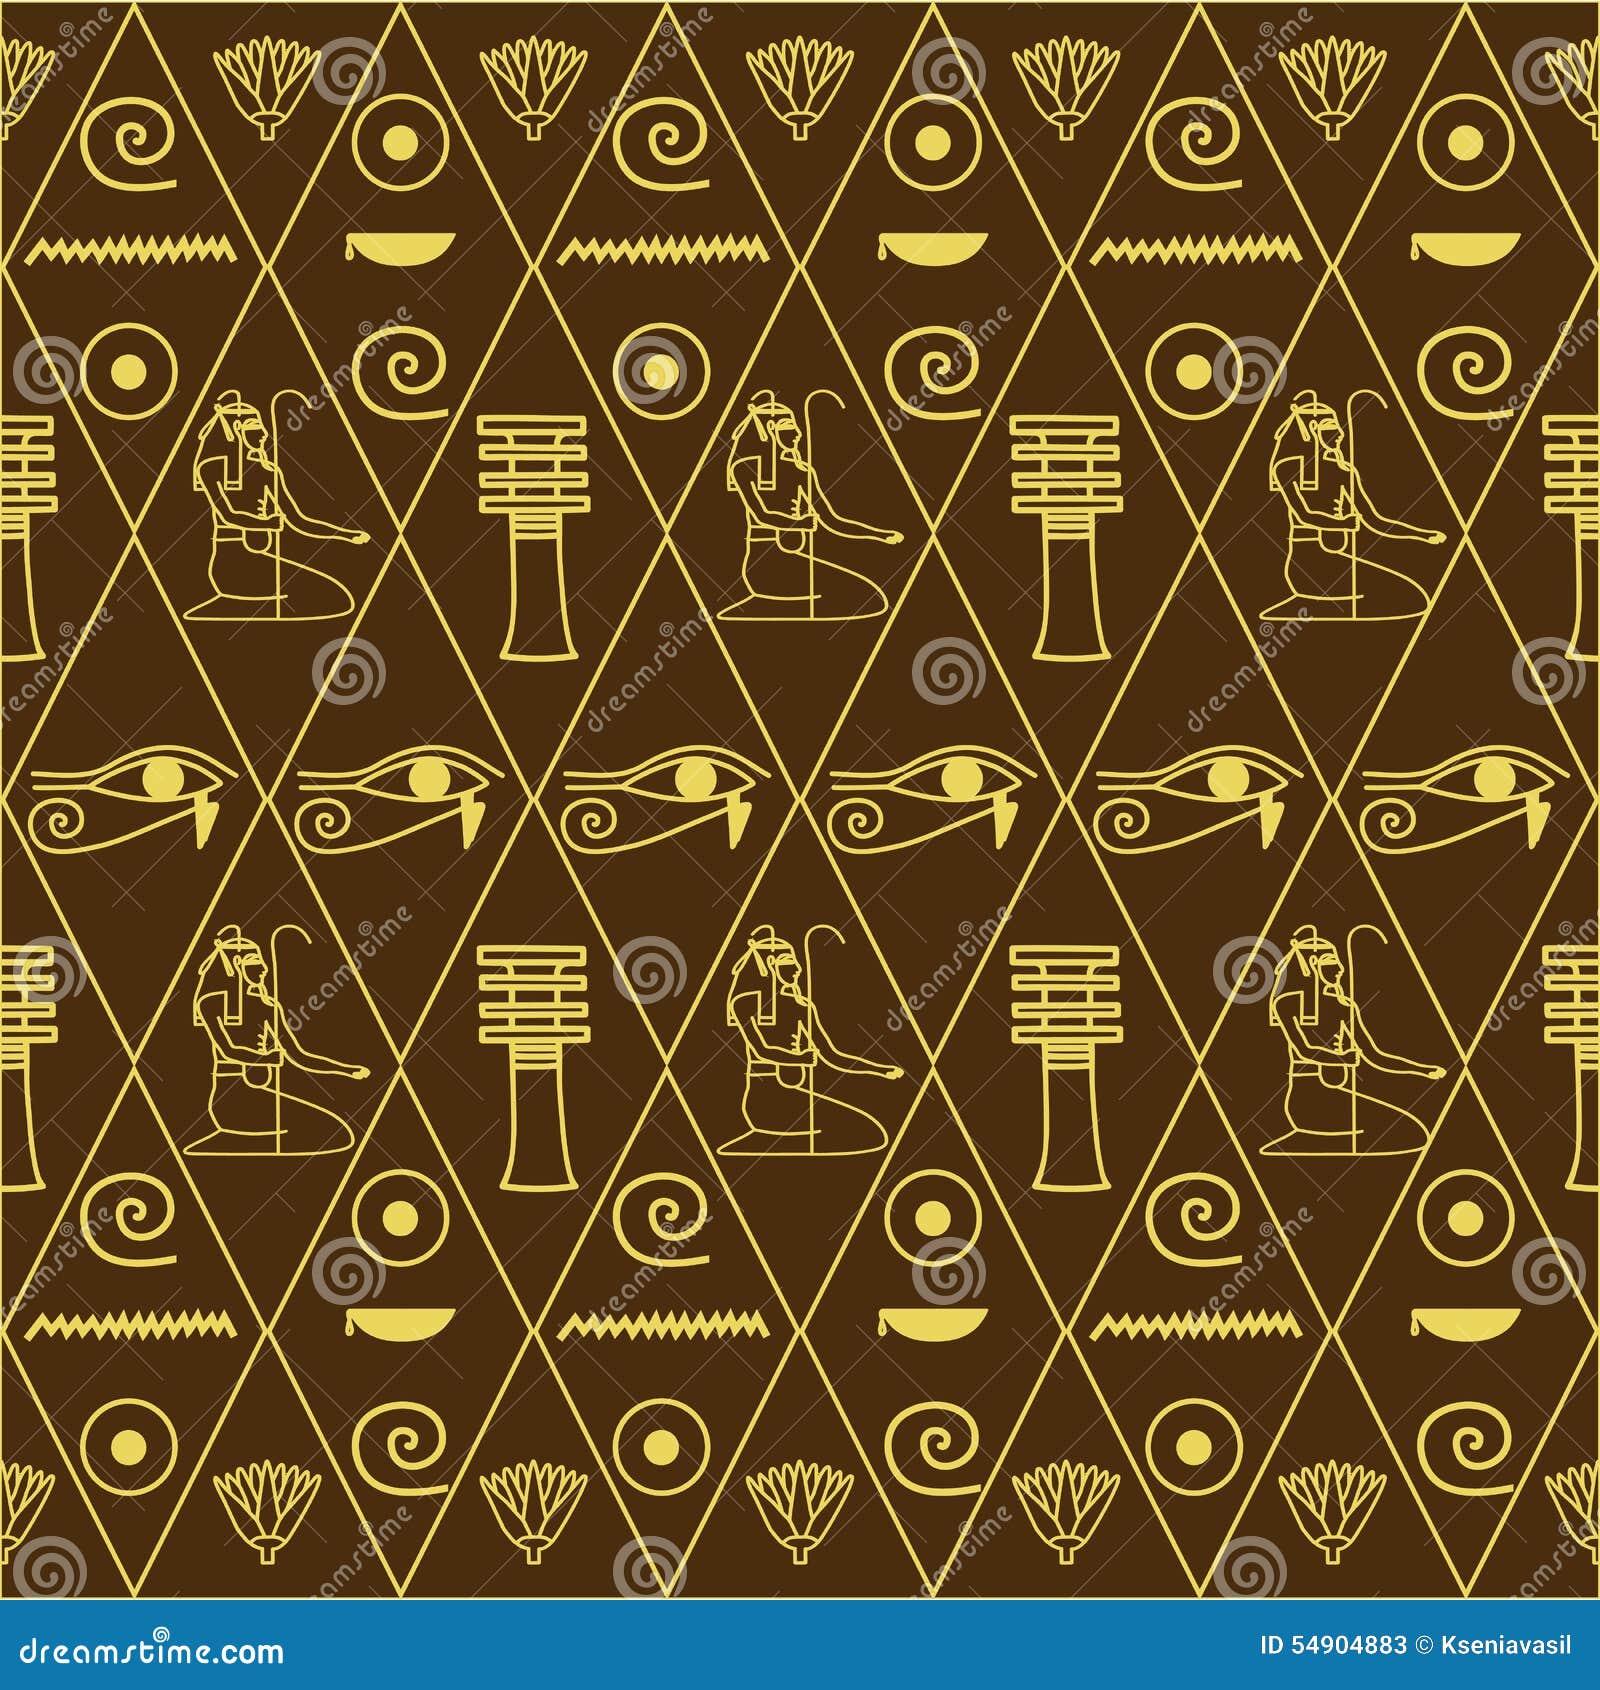 Pattern Of Egyptian Hieroglyphics Stock Vector - Image